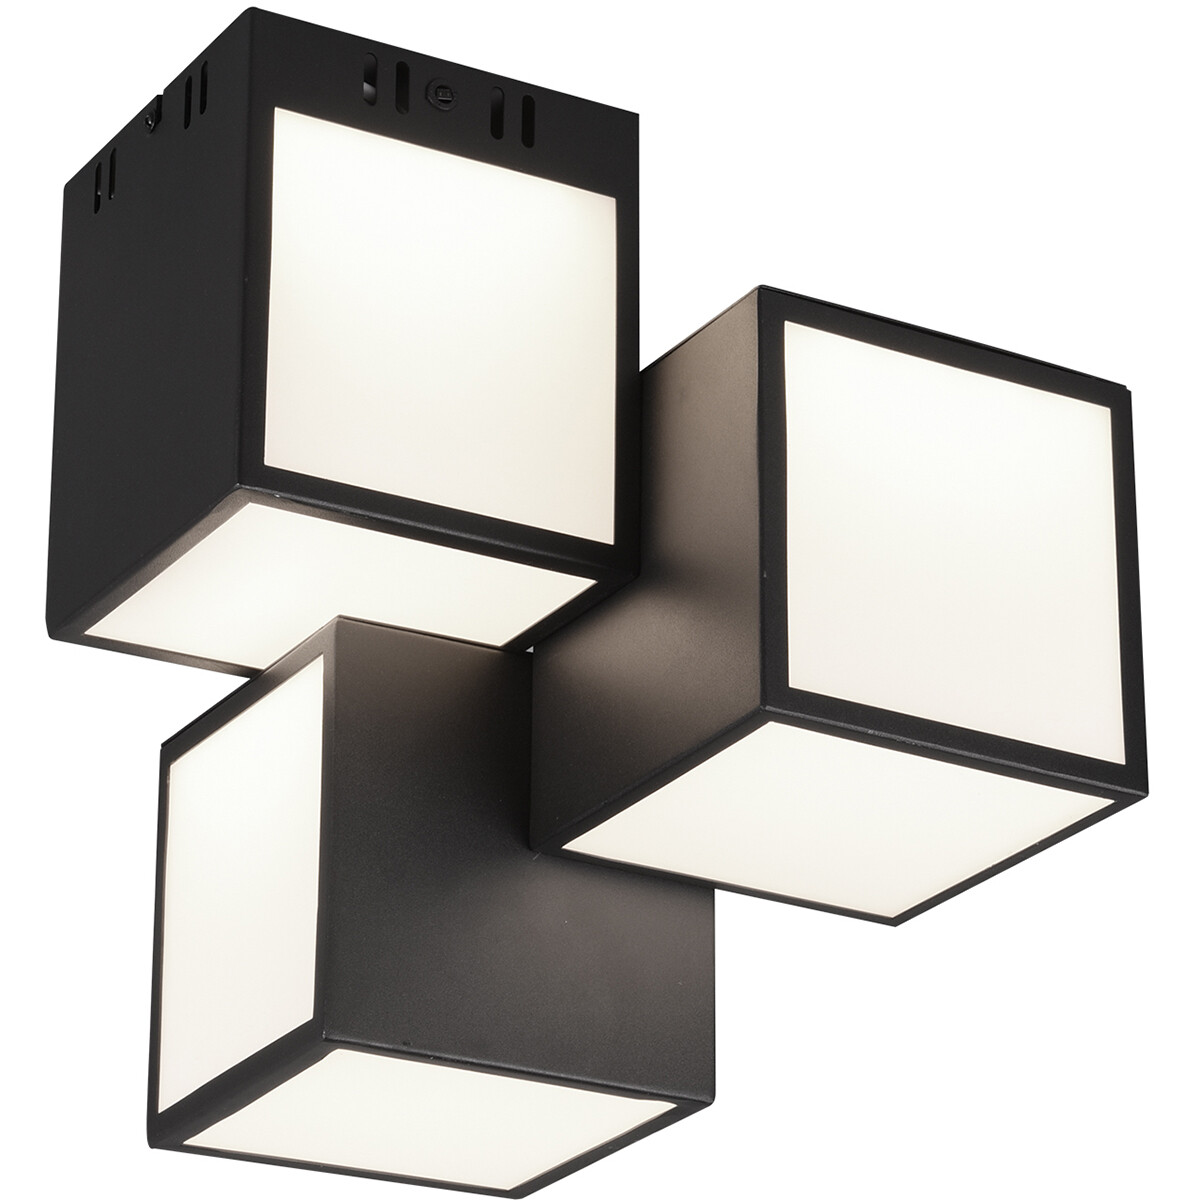 LED Plafondlamp WiZ - Smart LED - Plafondverlichting - Trion Oski - 24W - Aanpasbare Kleur - 3-licht